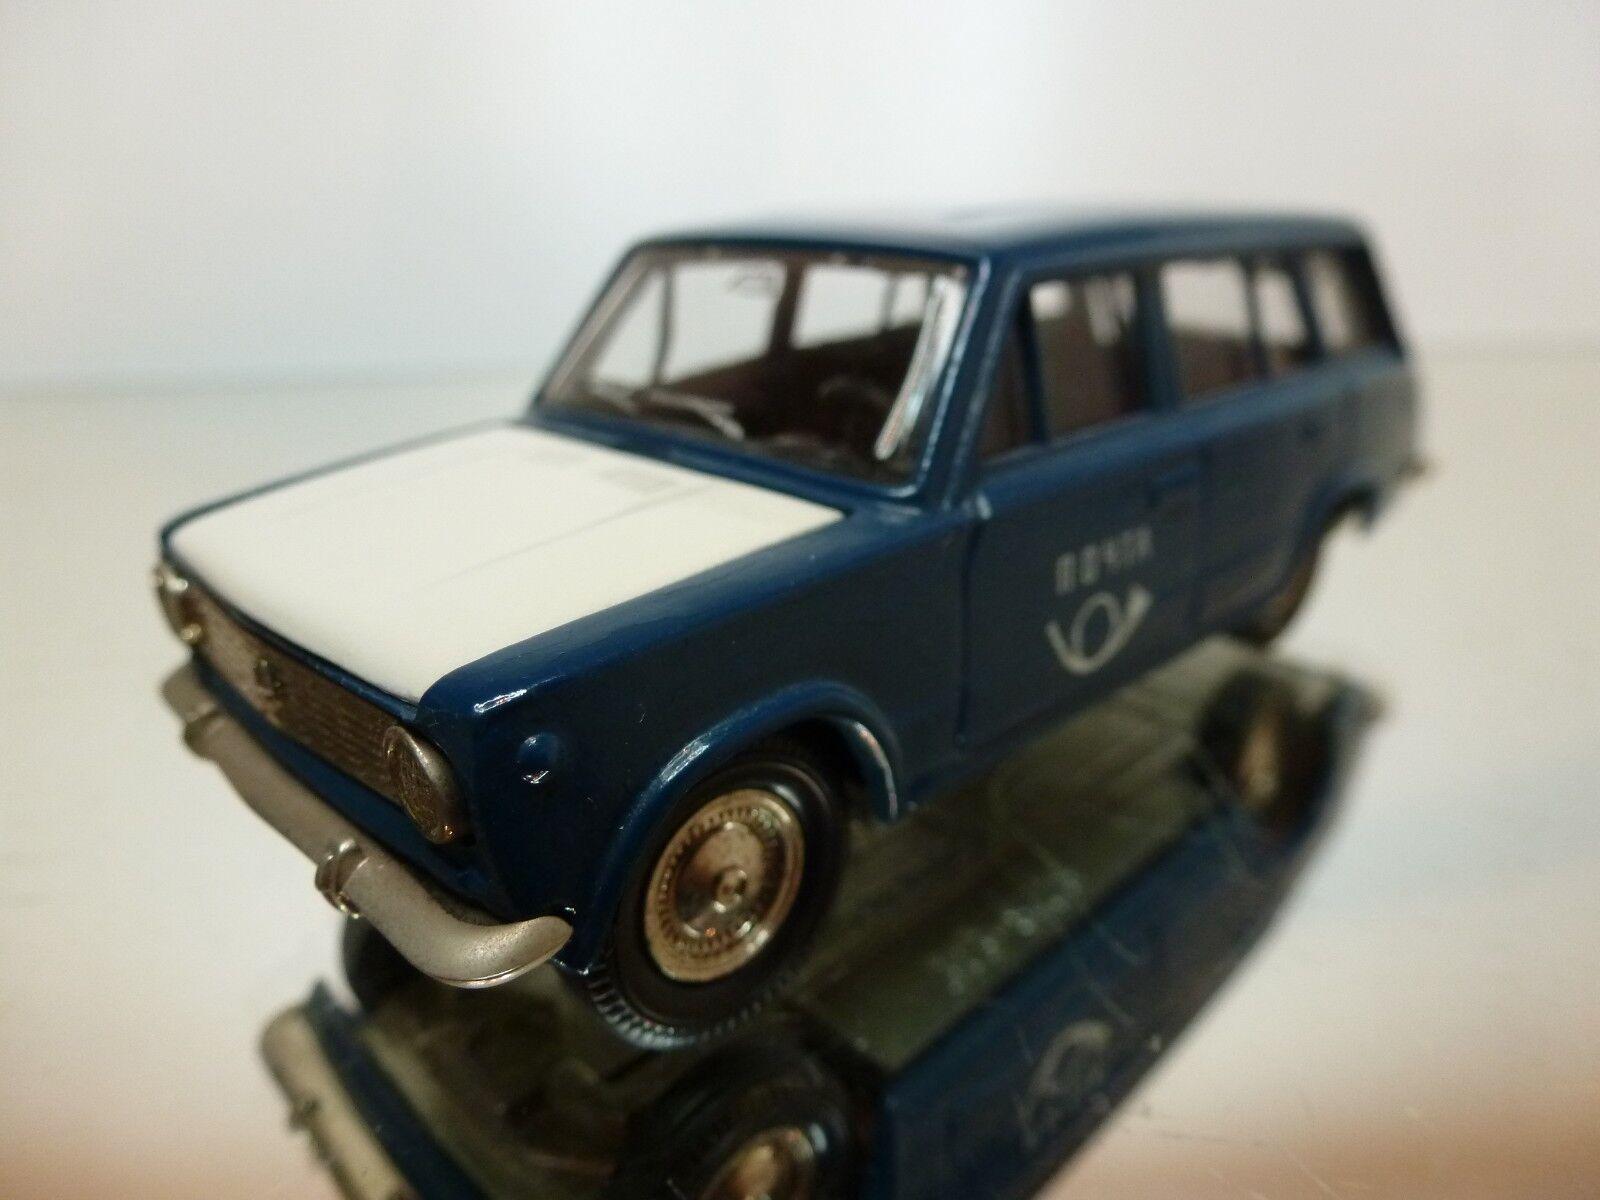 MADE IN USSR 2102  LADA COMBI-GAZ - blu + bianca 1 43 - EXCELLENT CONDITION - 2